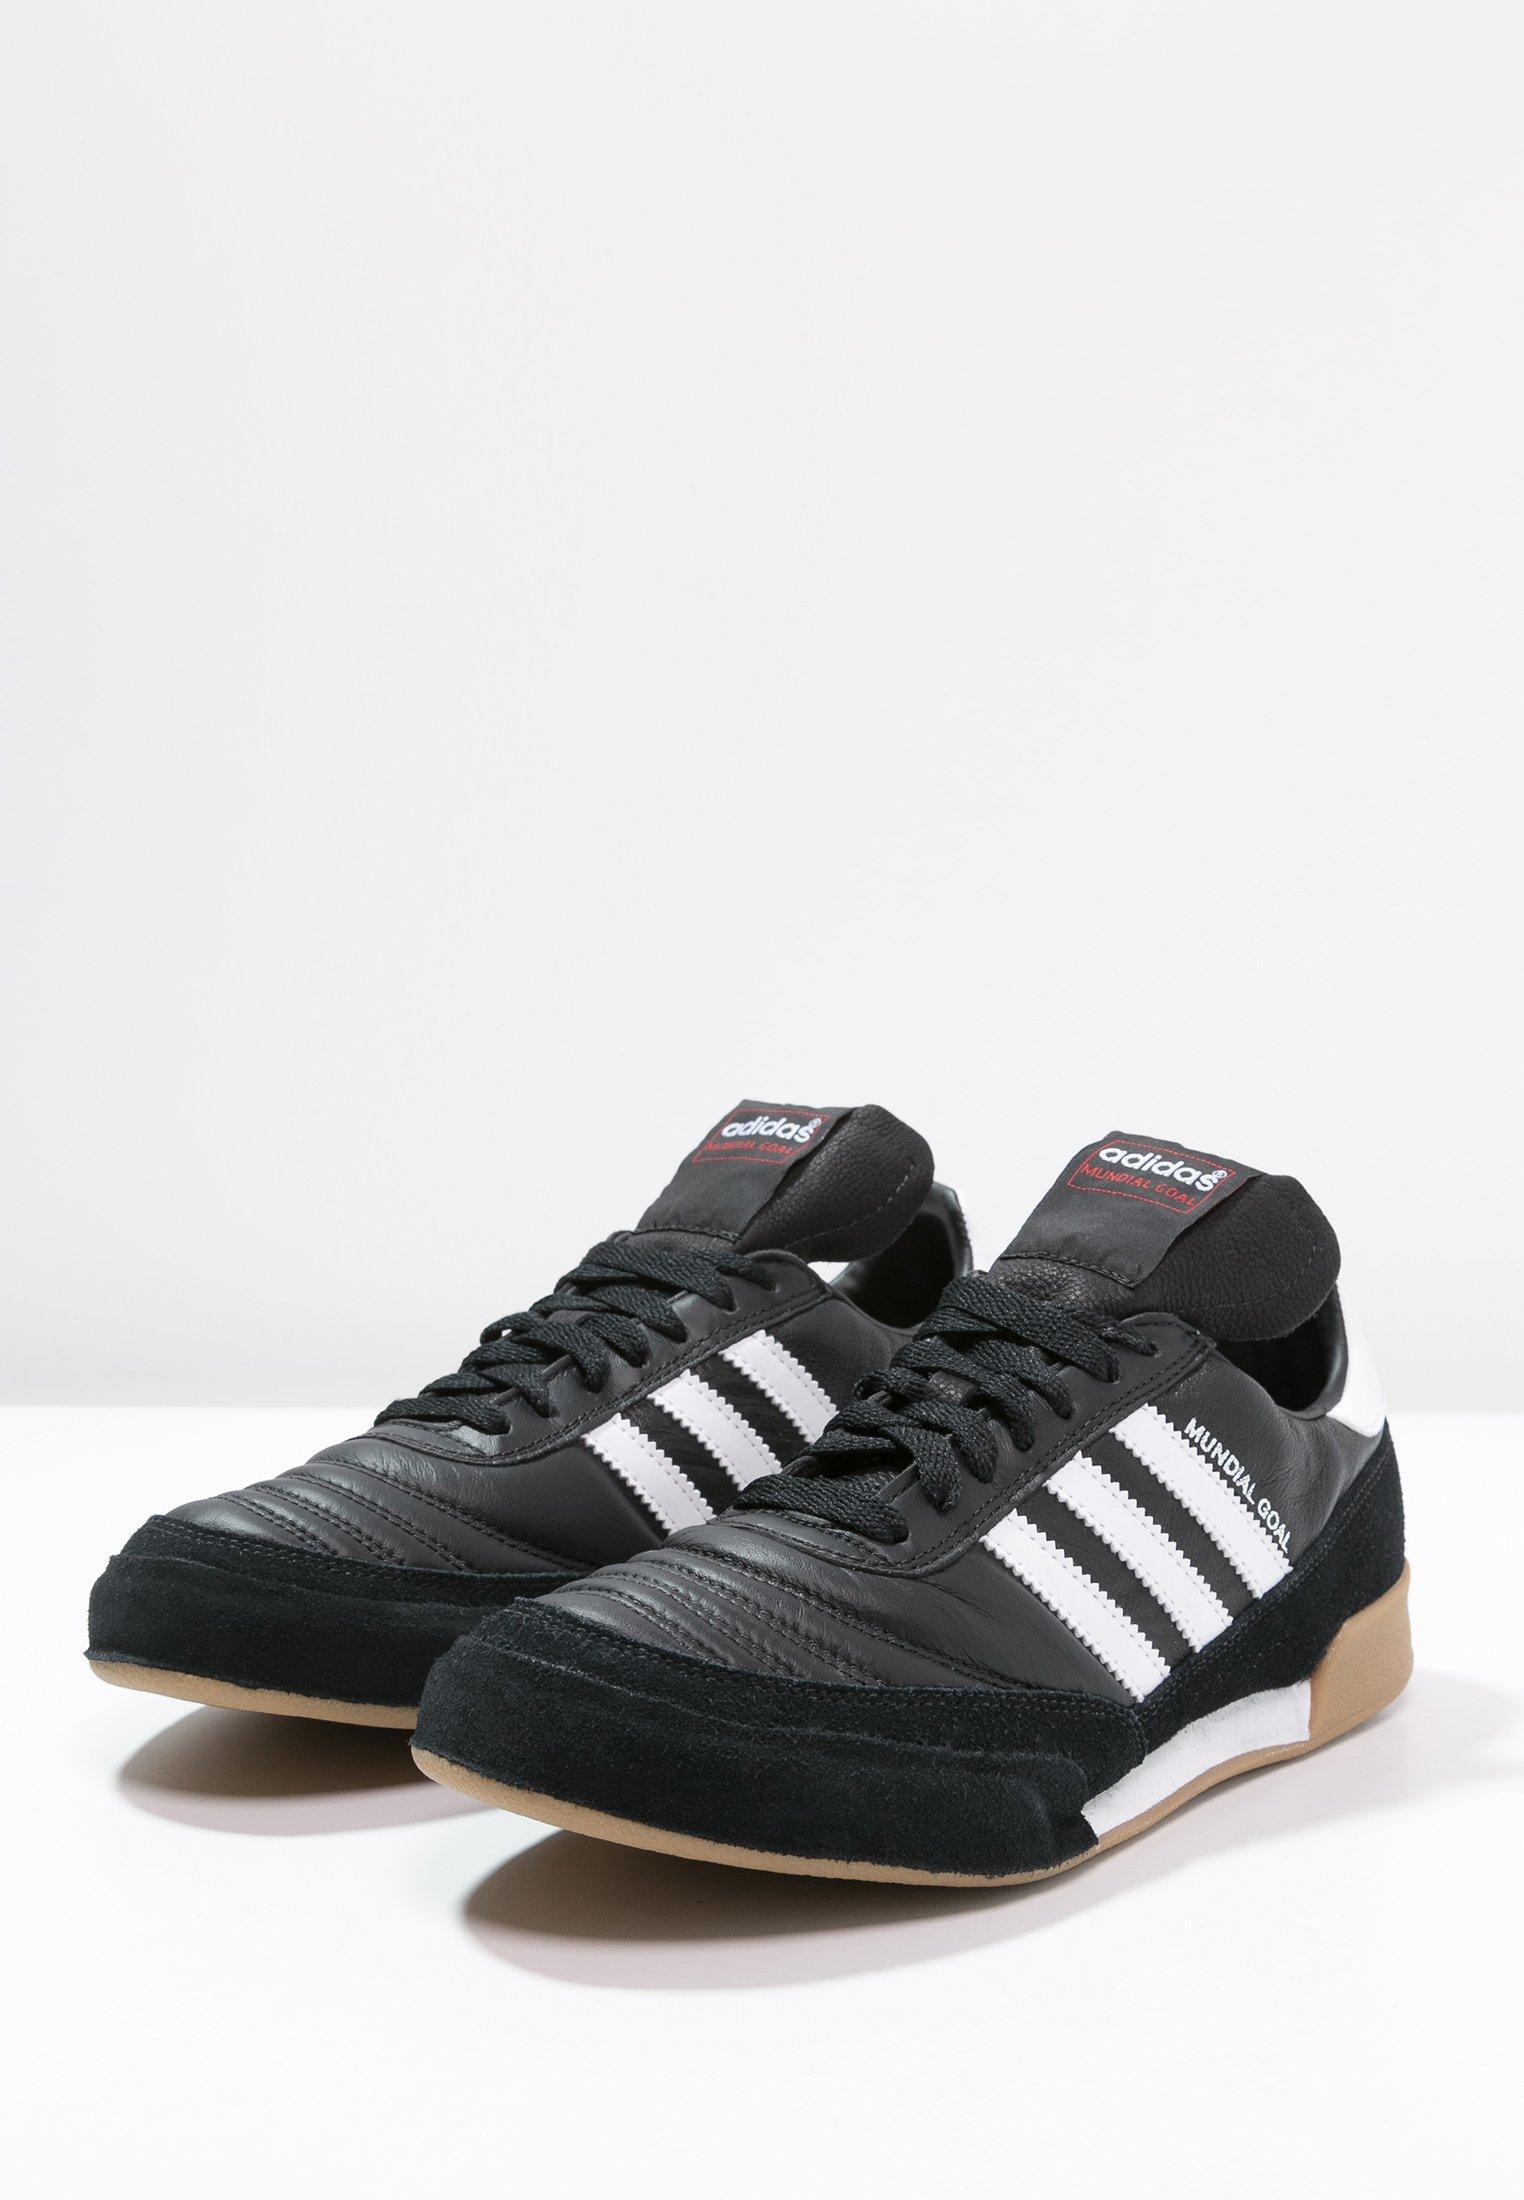 Adidas Performance Mundial Goal - Botas De Fútbol Sin Tacos Noir/blanc